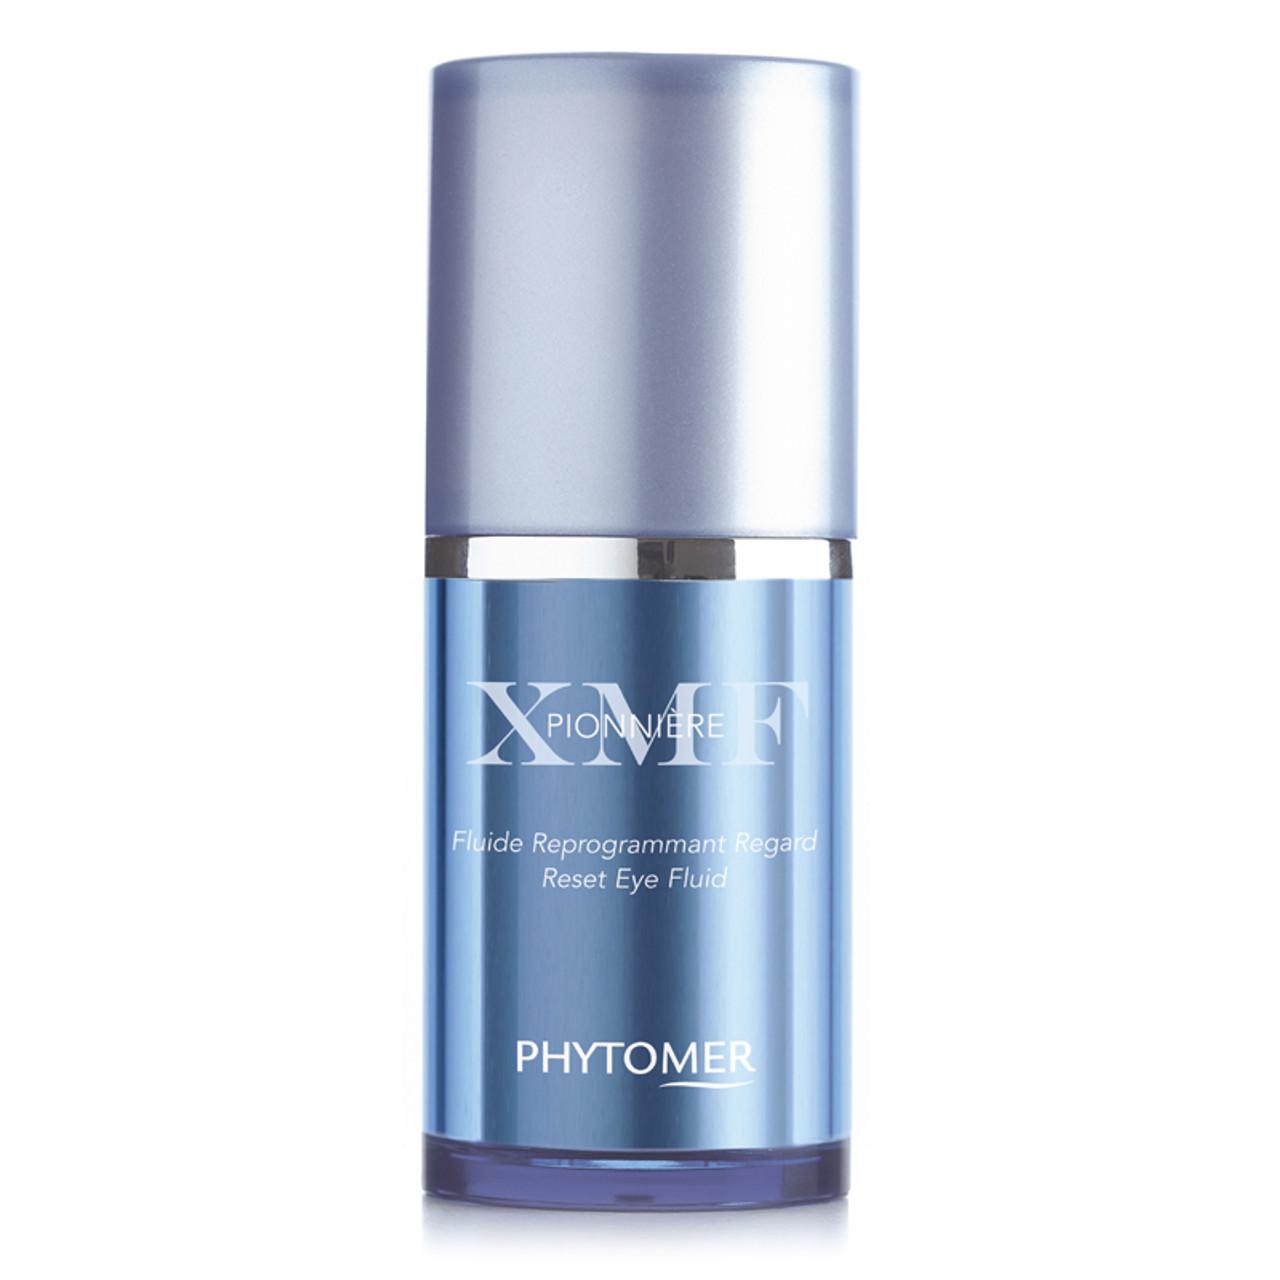 Phytomer Pionniere Xmf Reset Eye Fluid